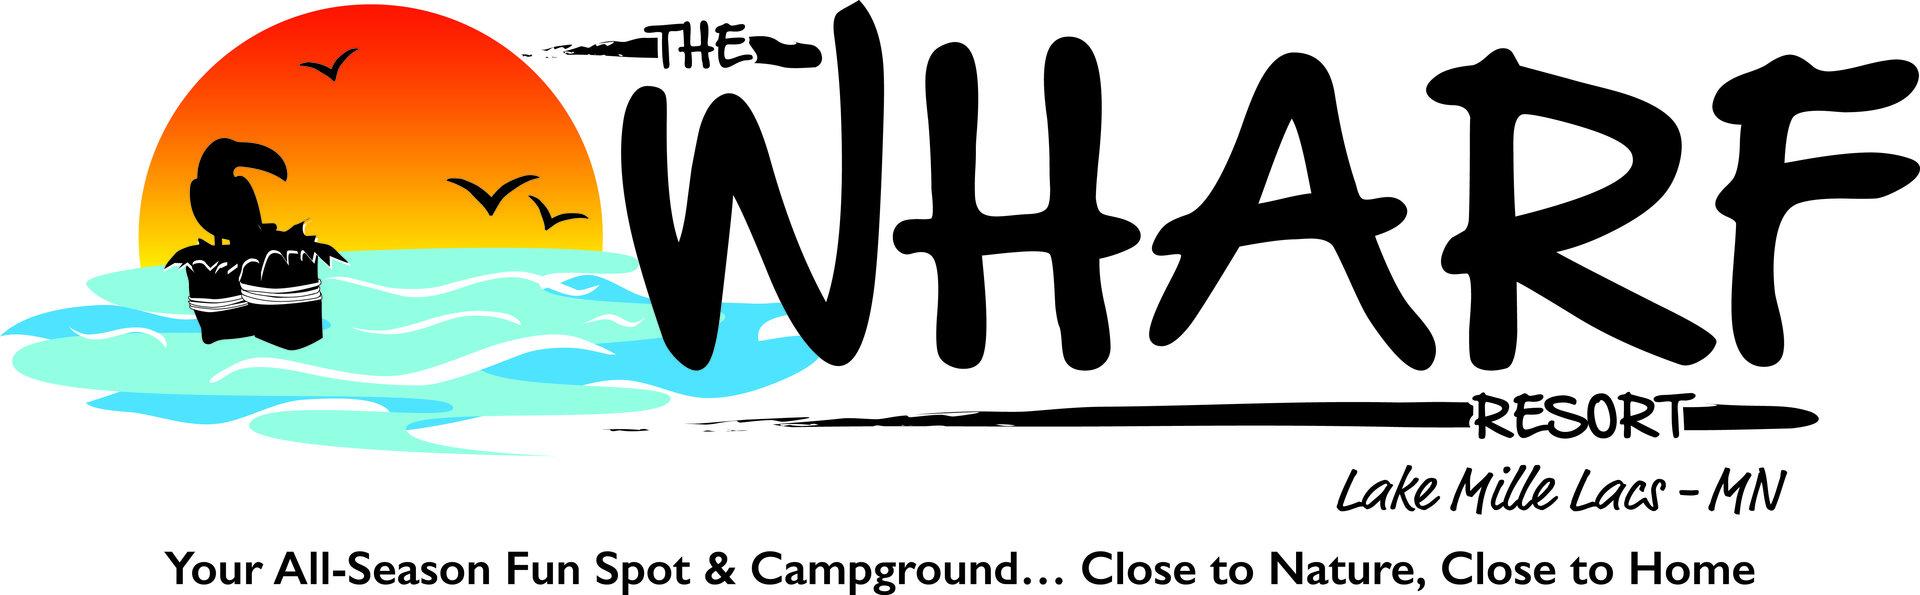 The Wharf Resort - logo